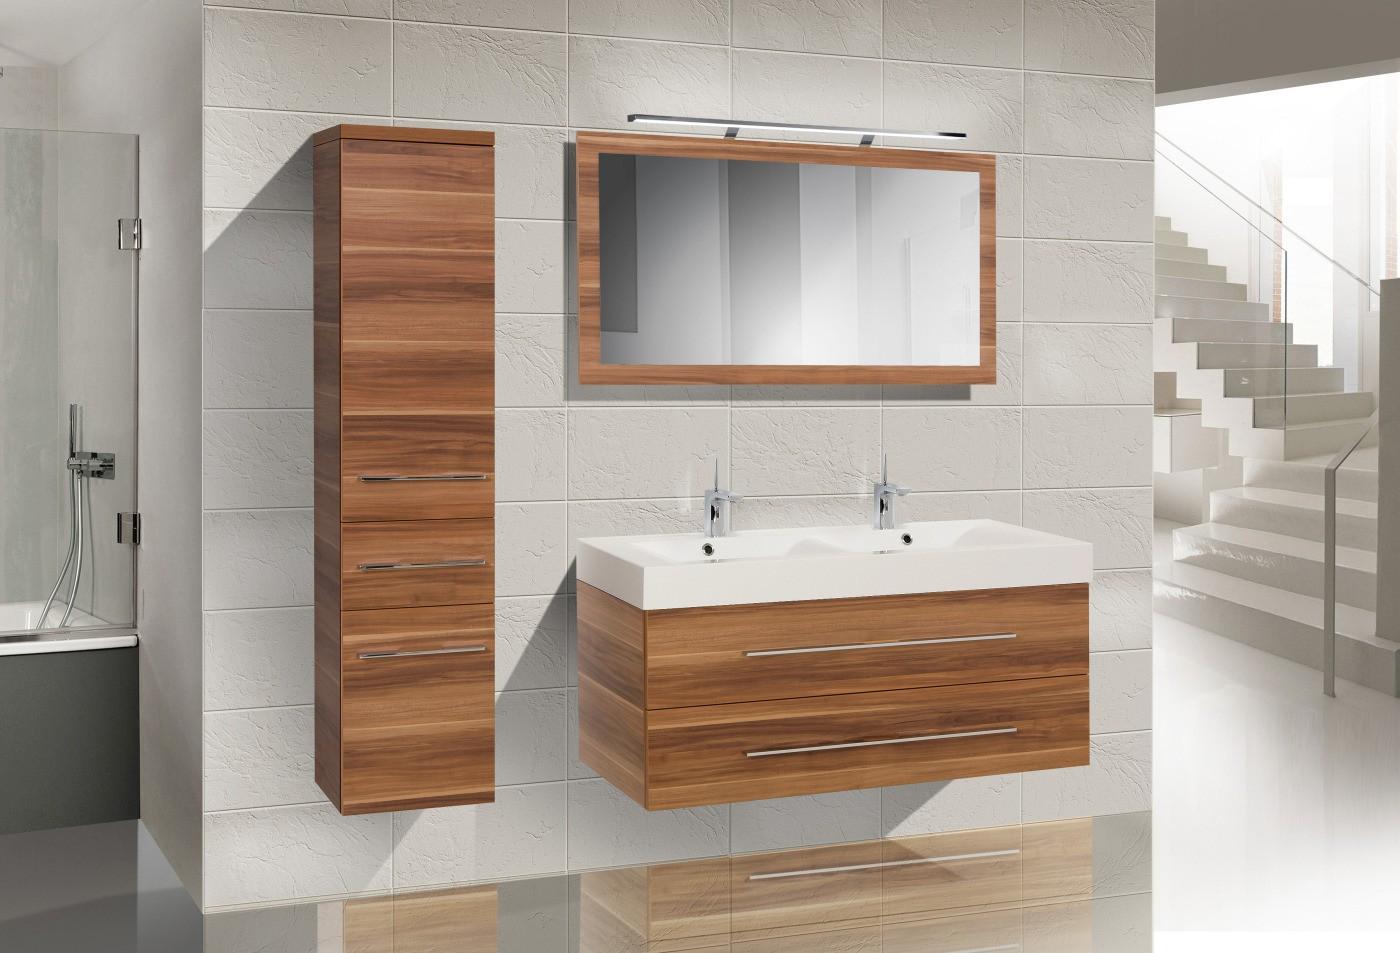 badm bel set mit doppelwaschtisch 120 cm 634. Black Bedroom Furniture Sets. Home Design Ideas